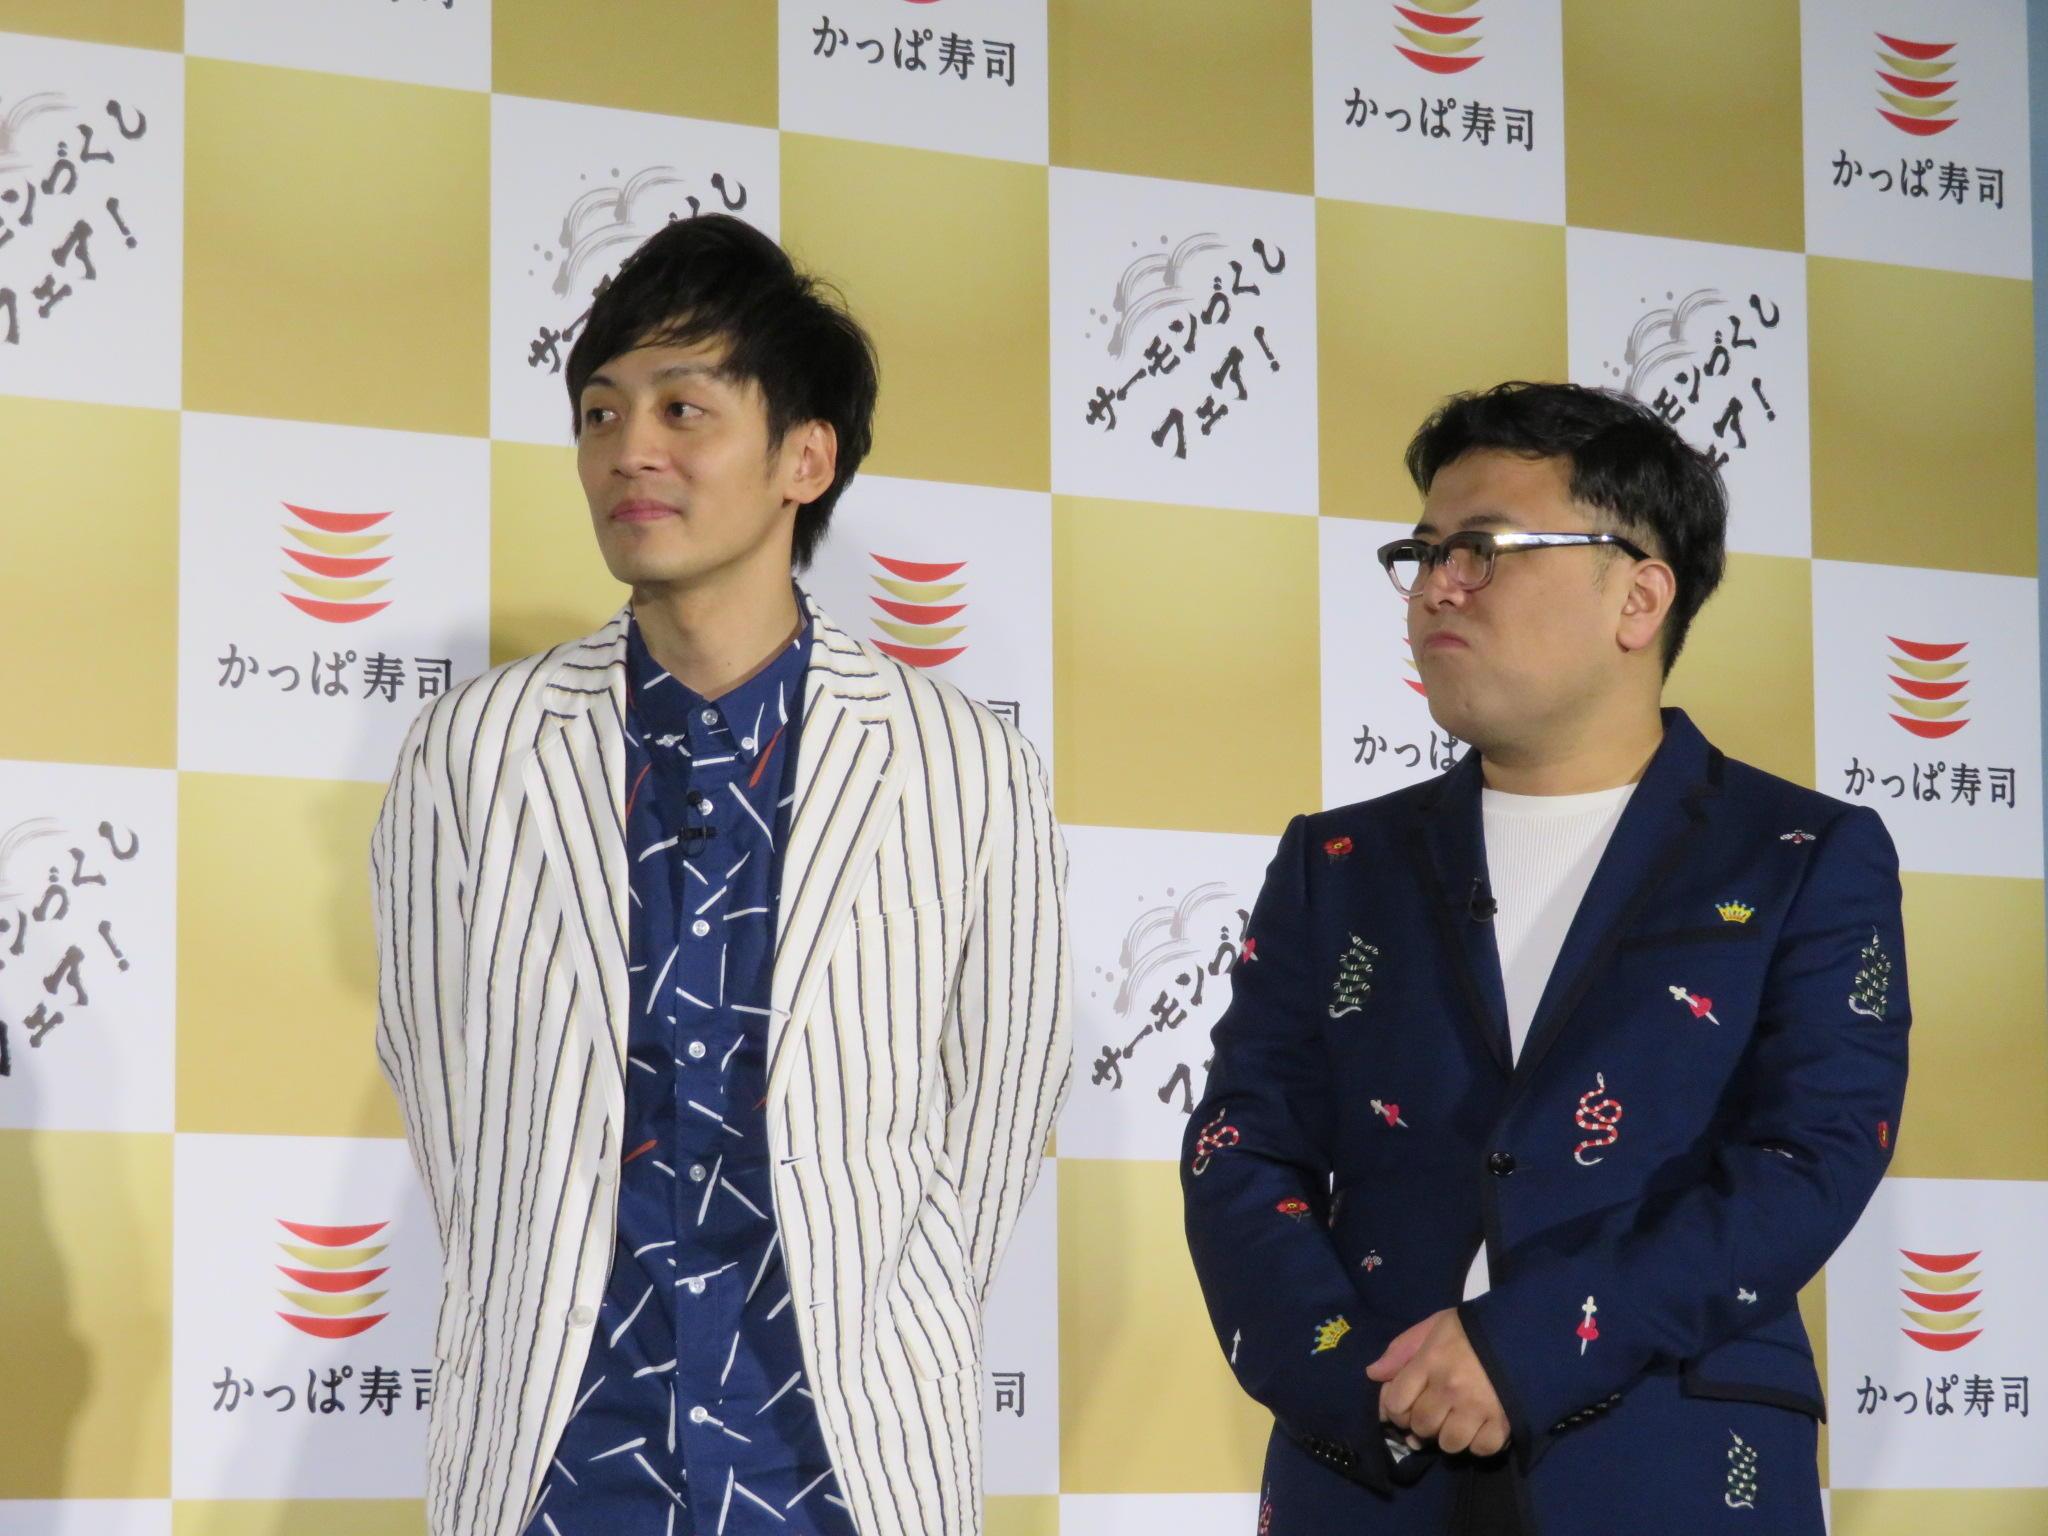 http://news.yoshimoto.co.jp/20180110175330-d83bbfa0bcf6e743ae2266a7a7553247796200fa.jpg